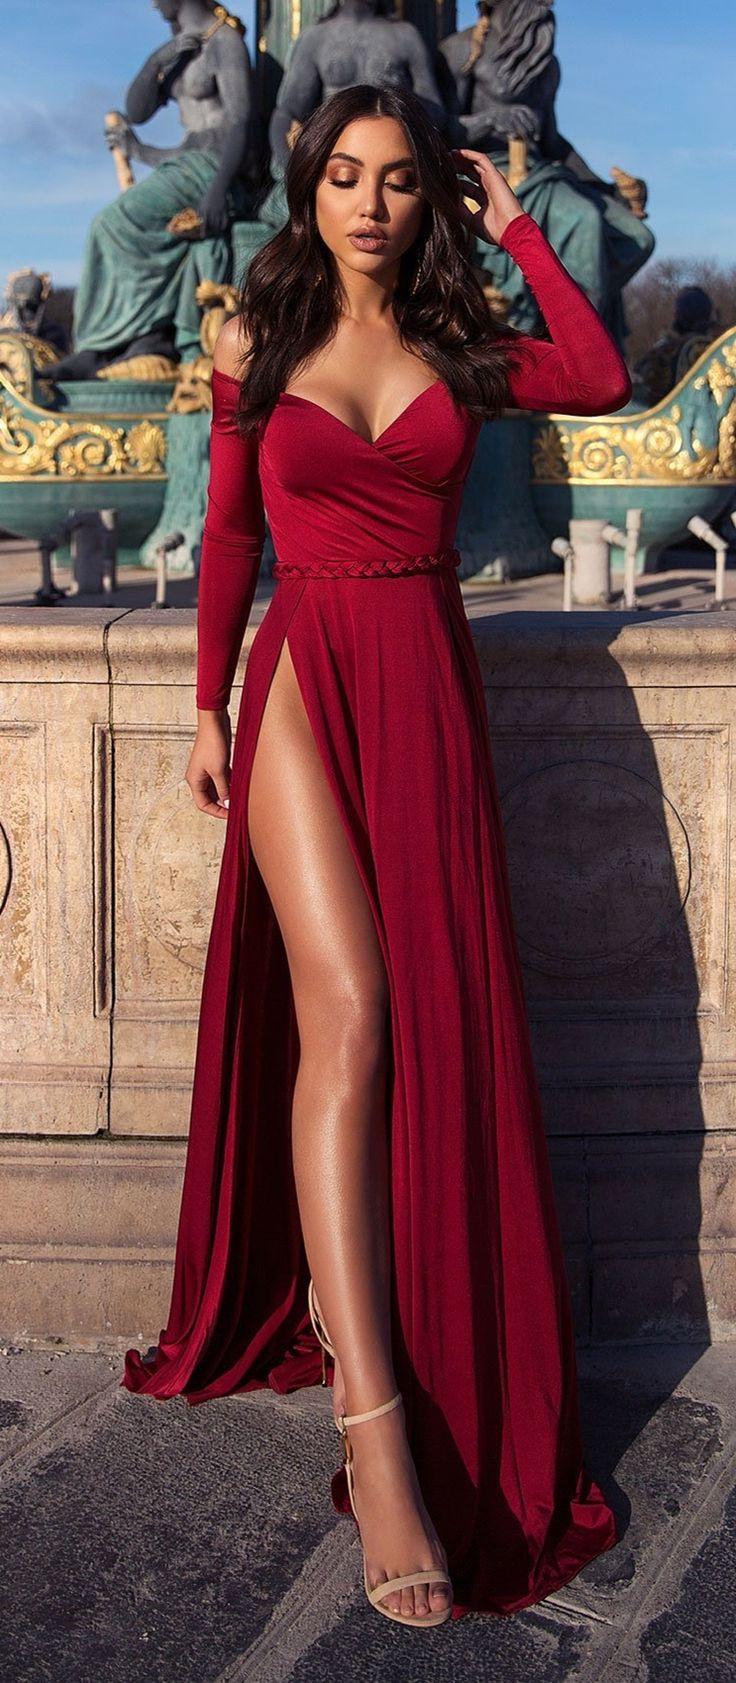 A-Line Off-the-Shoulder Long Sleeves Floor-Length Burgundy Prom Dress with Split 11